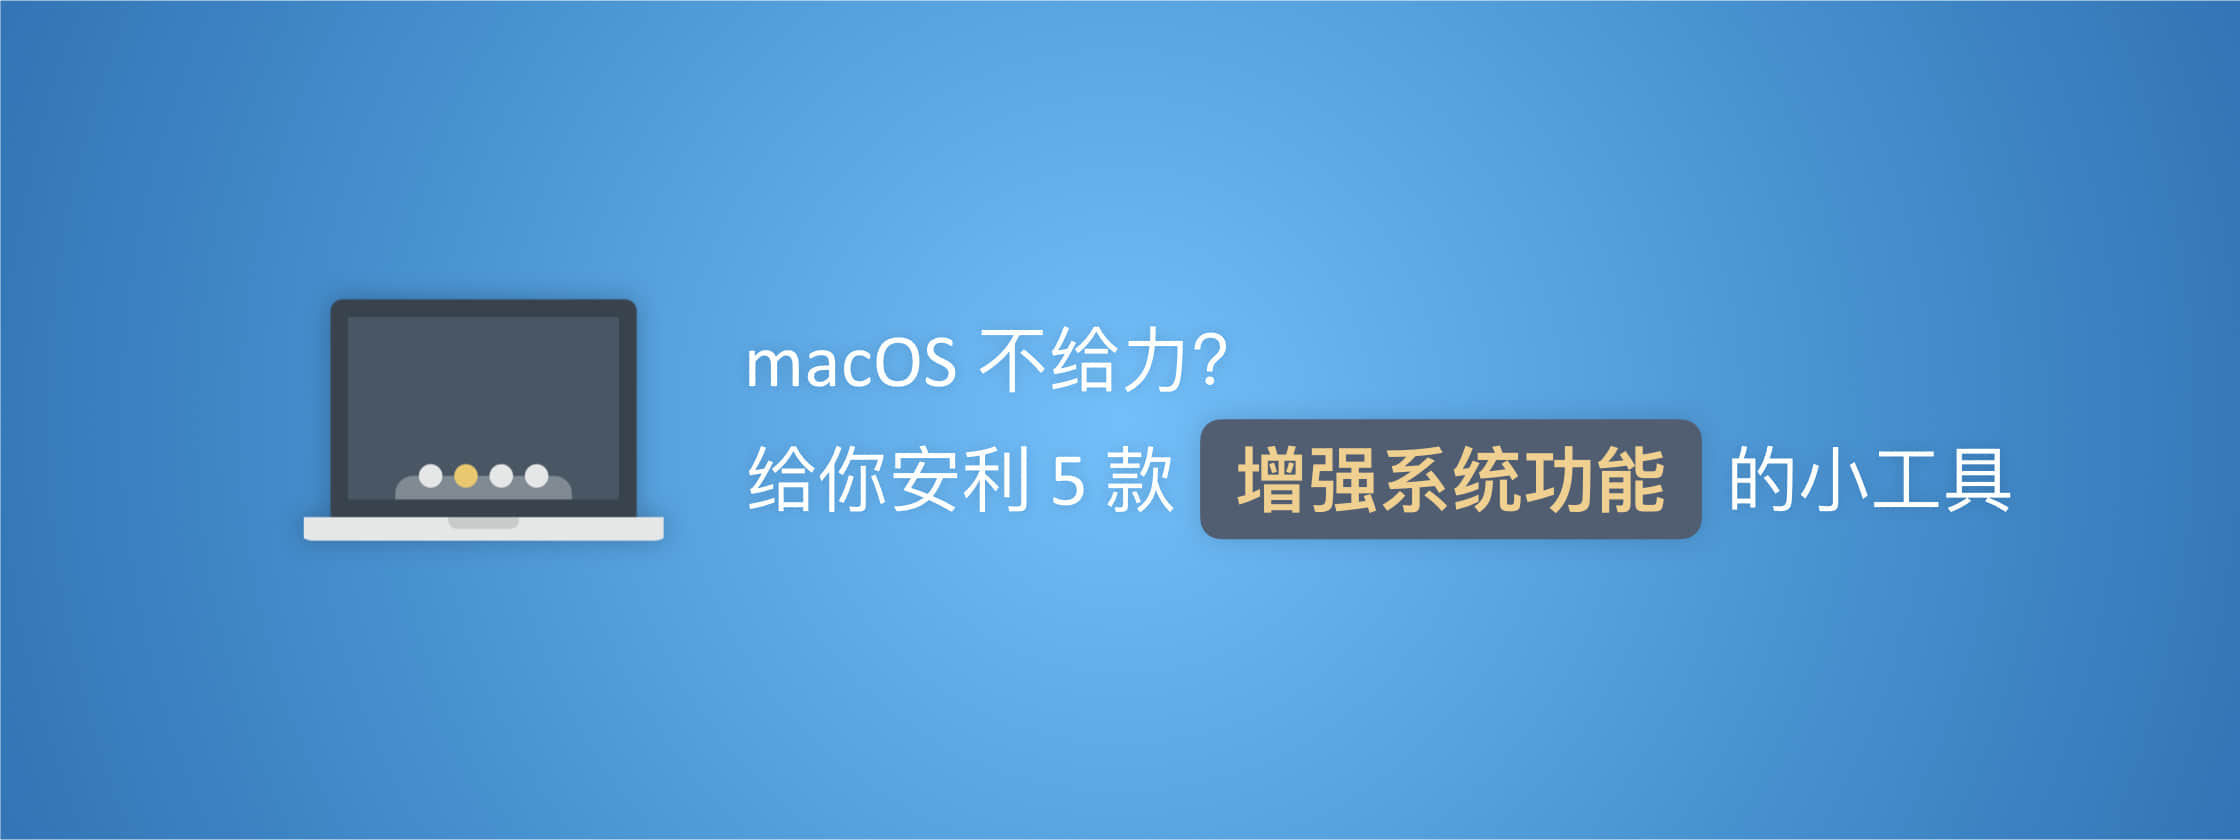 macOS 不给力?给你安利这 5 款增强系统功能的小工具